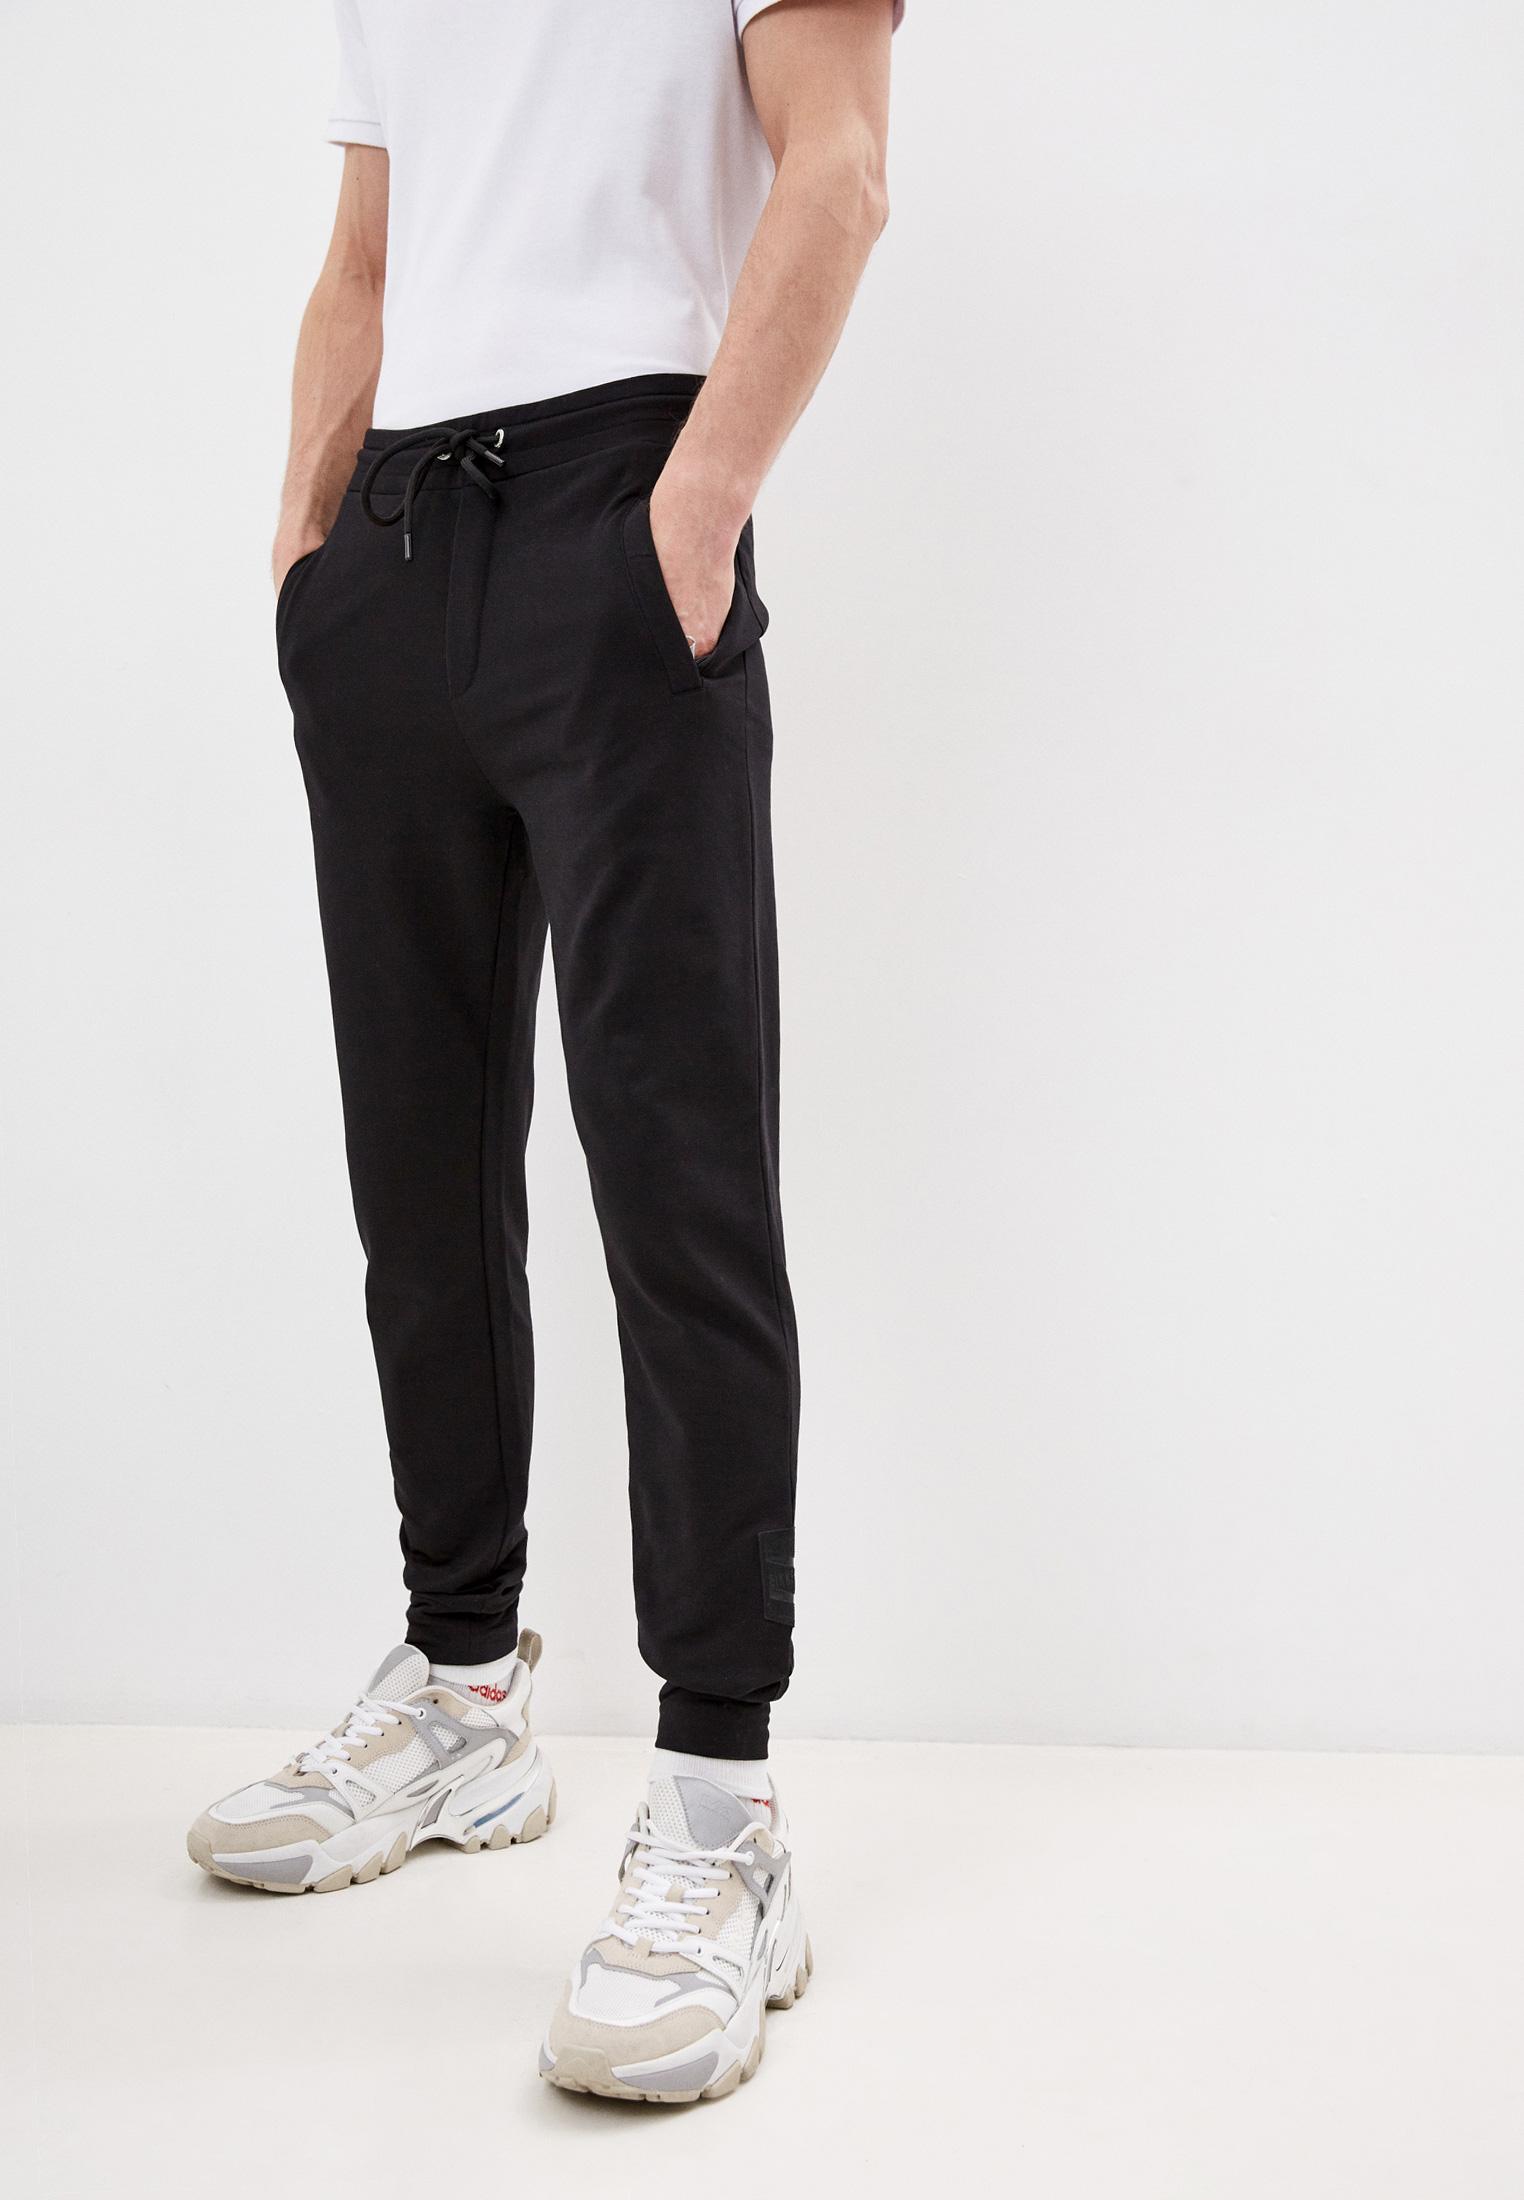 Мужские спортивные брюки Bikkembergs (Биккембергс) C 1 006 86 E 1949